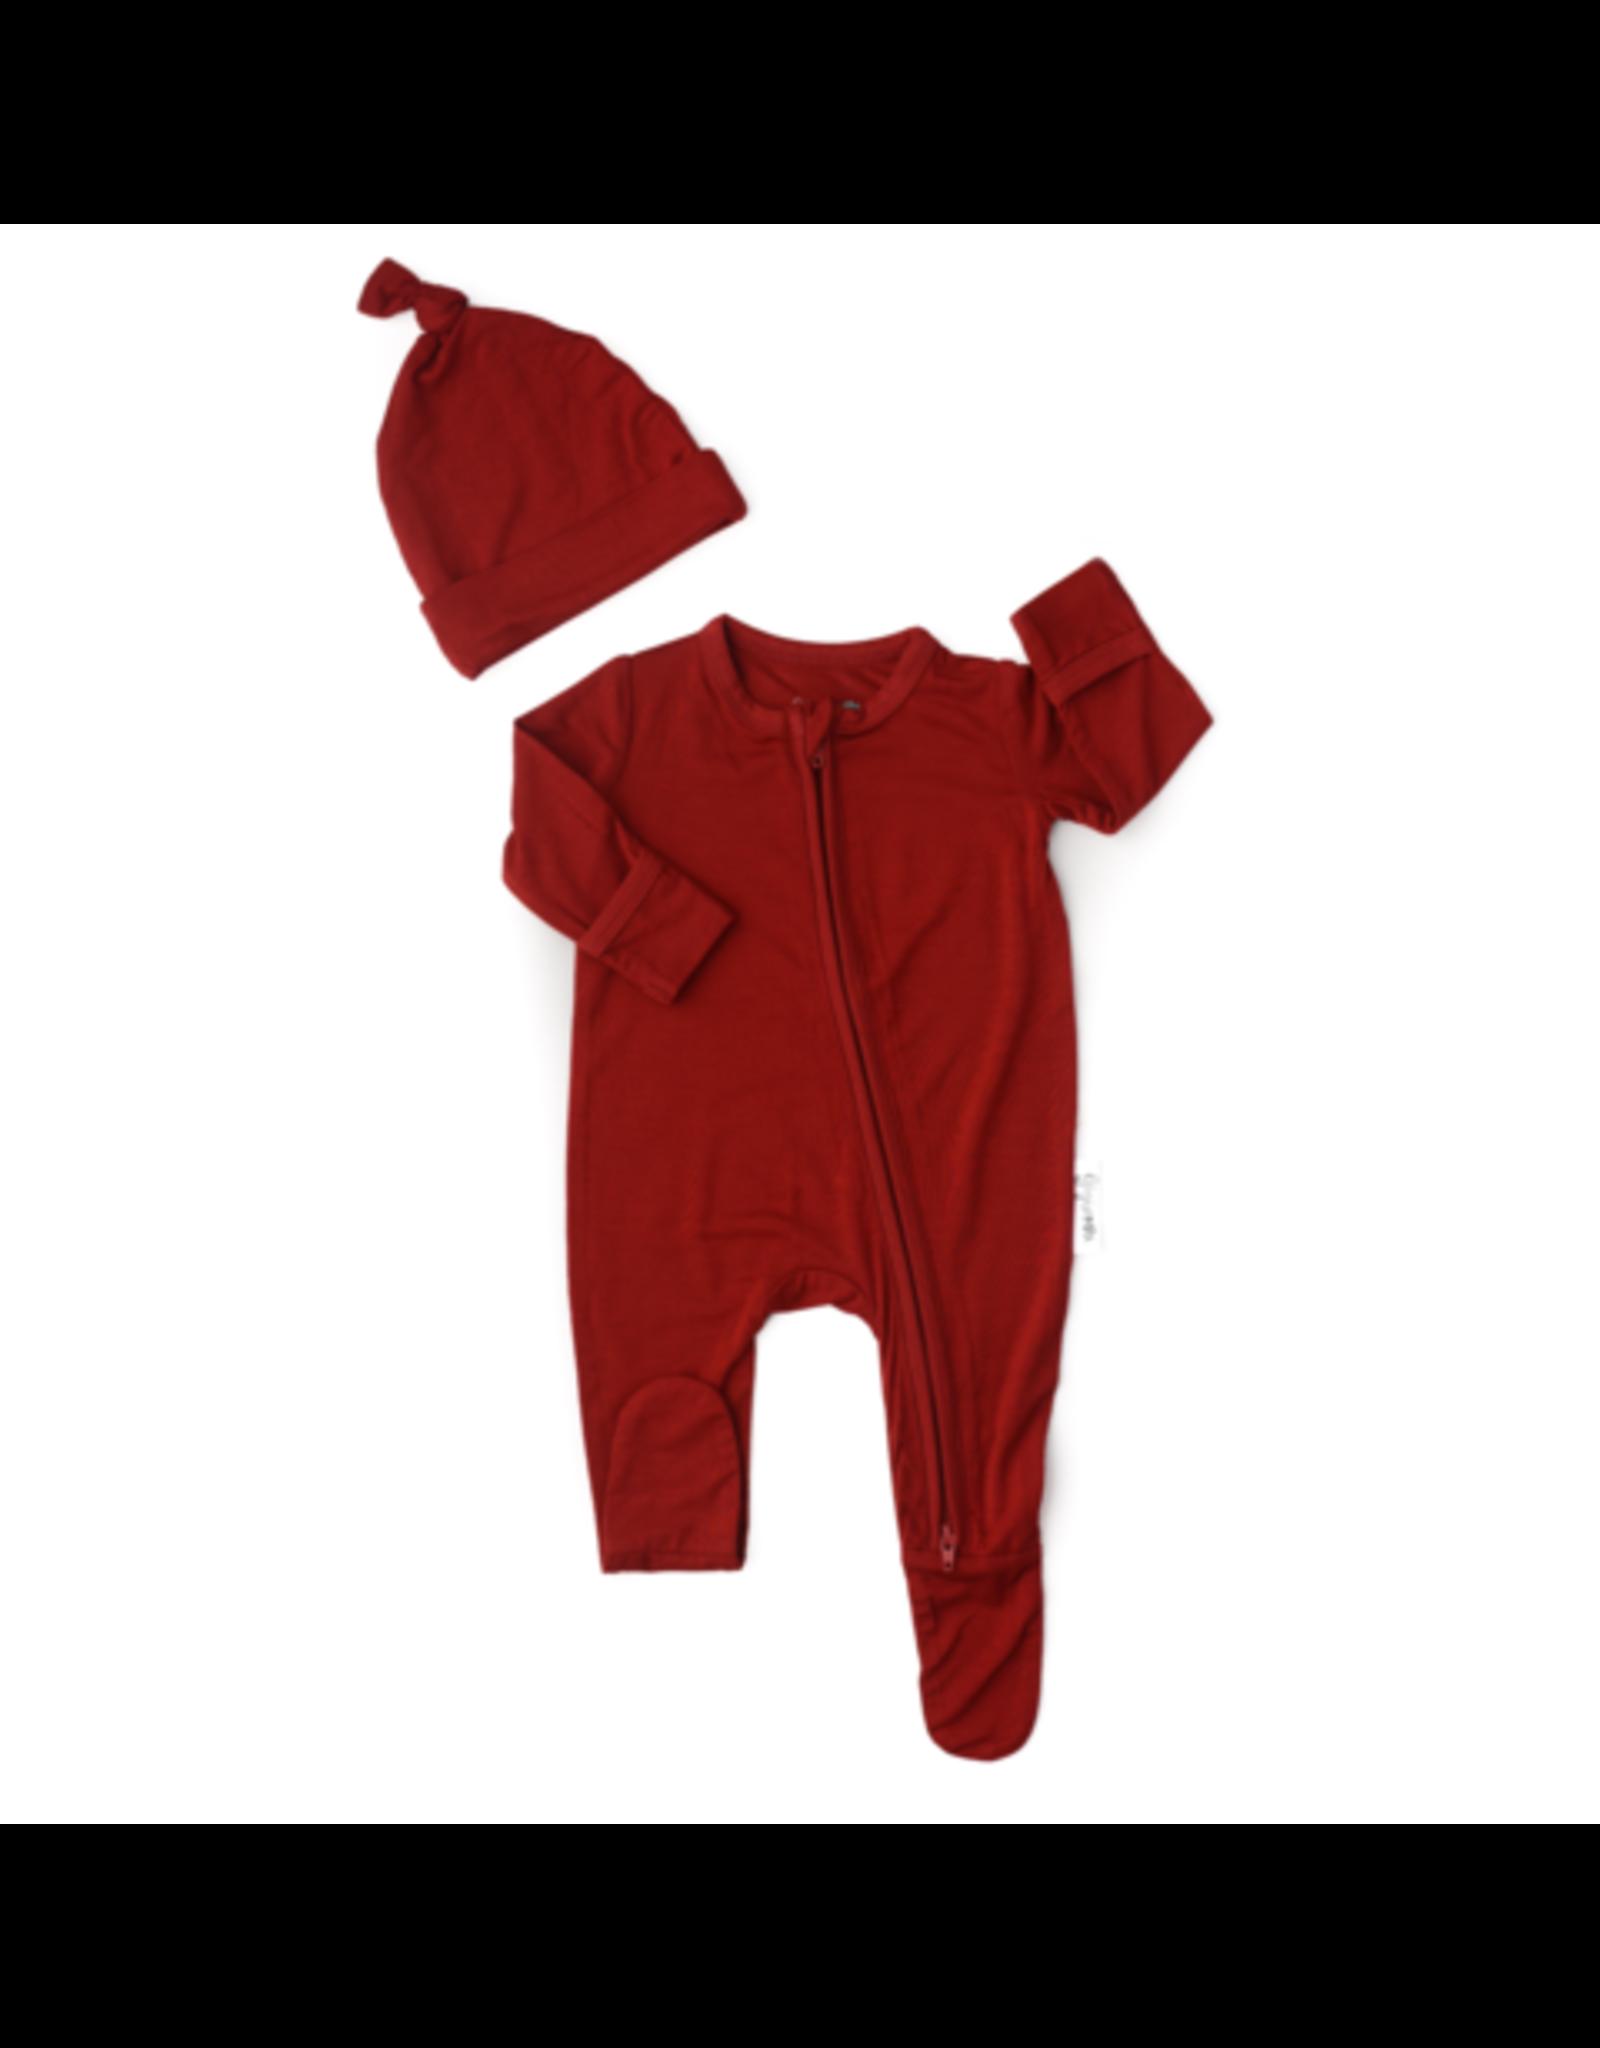 Gigi & Max Gigi & Max - Sawyer Red Rust Newborn Footed Zip & Hat Set